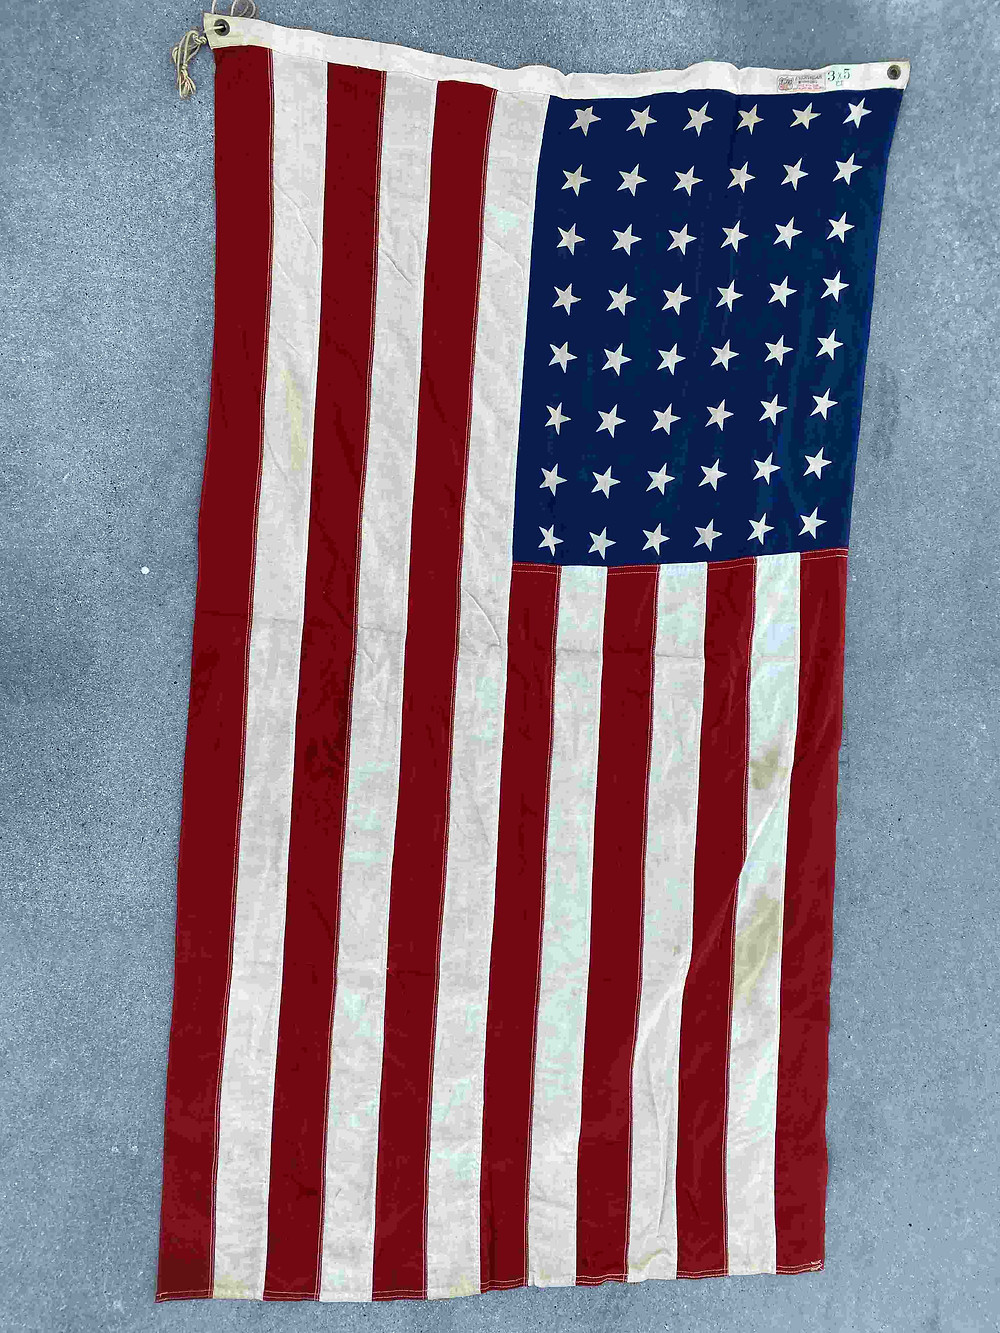 dettra flag companyのヴィンテージフラッグ